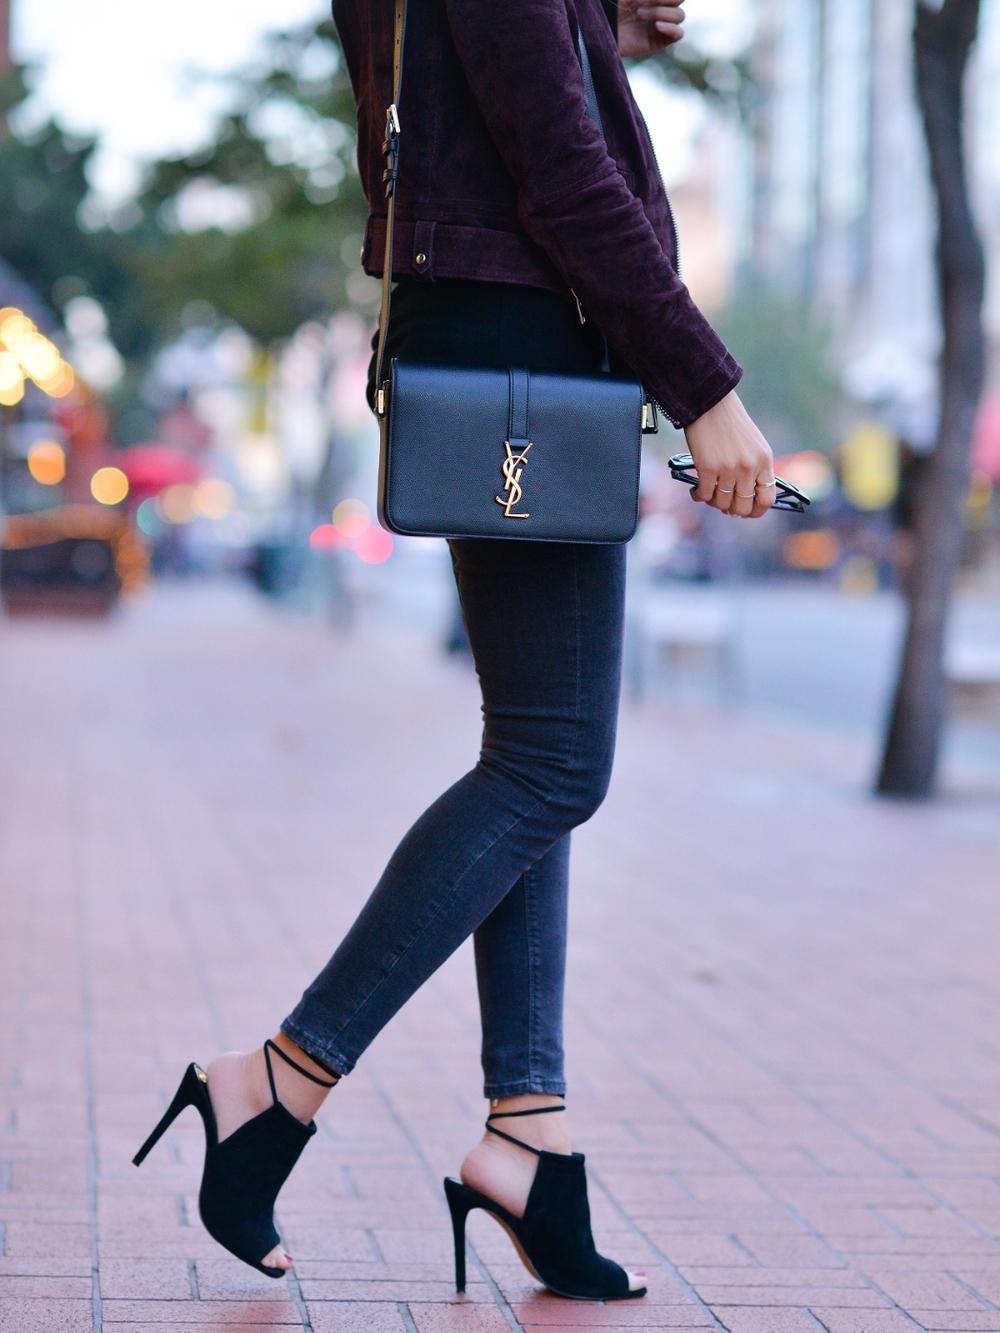 BlankNYC_MotoJacket_Streetstyle_Fashion_Blogger_Topshop_SanDiego_LucysWhims_SaintLaurent.jpg